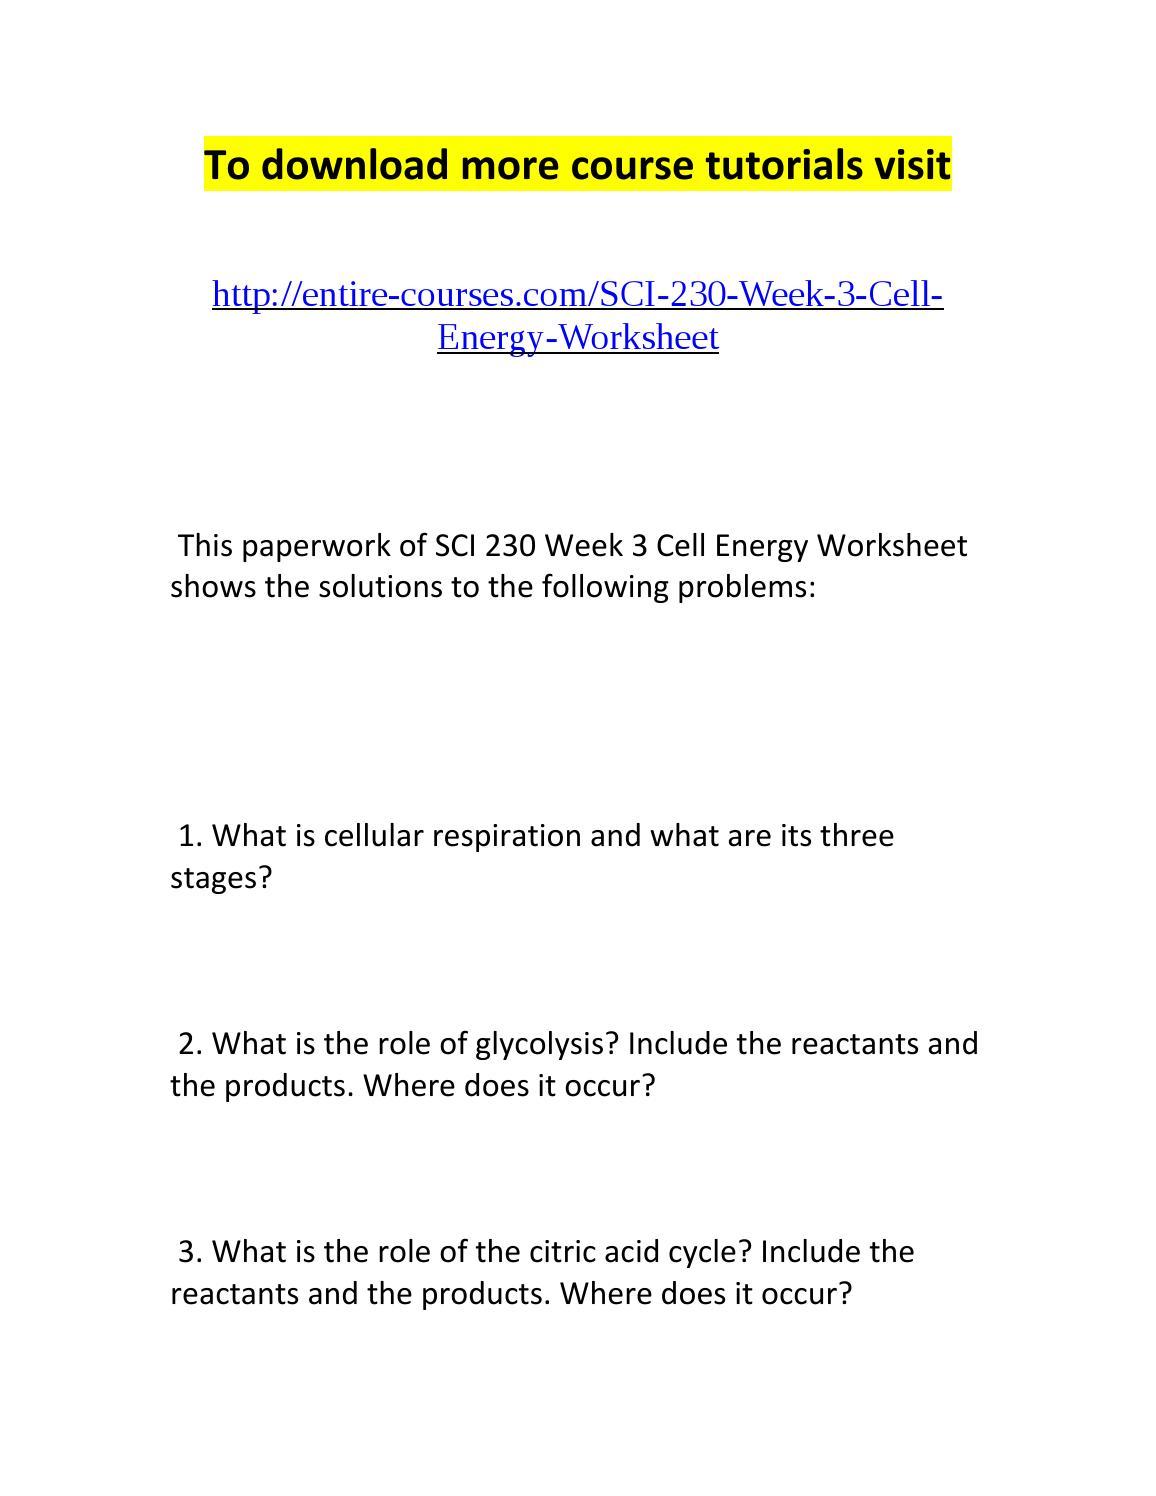 Sci 230 week 3 cell energy worksheet by Gary Kue - issuu